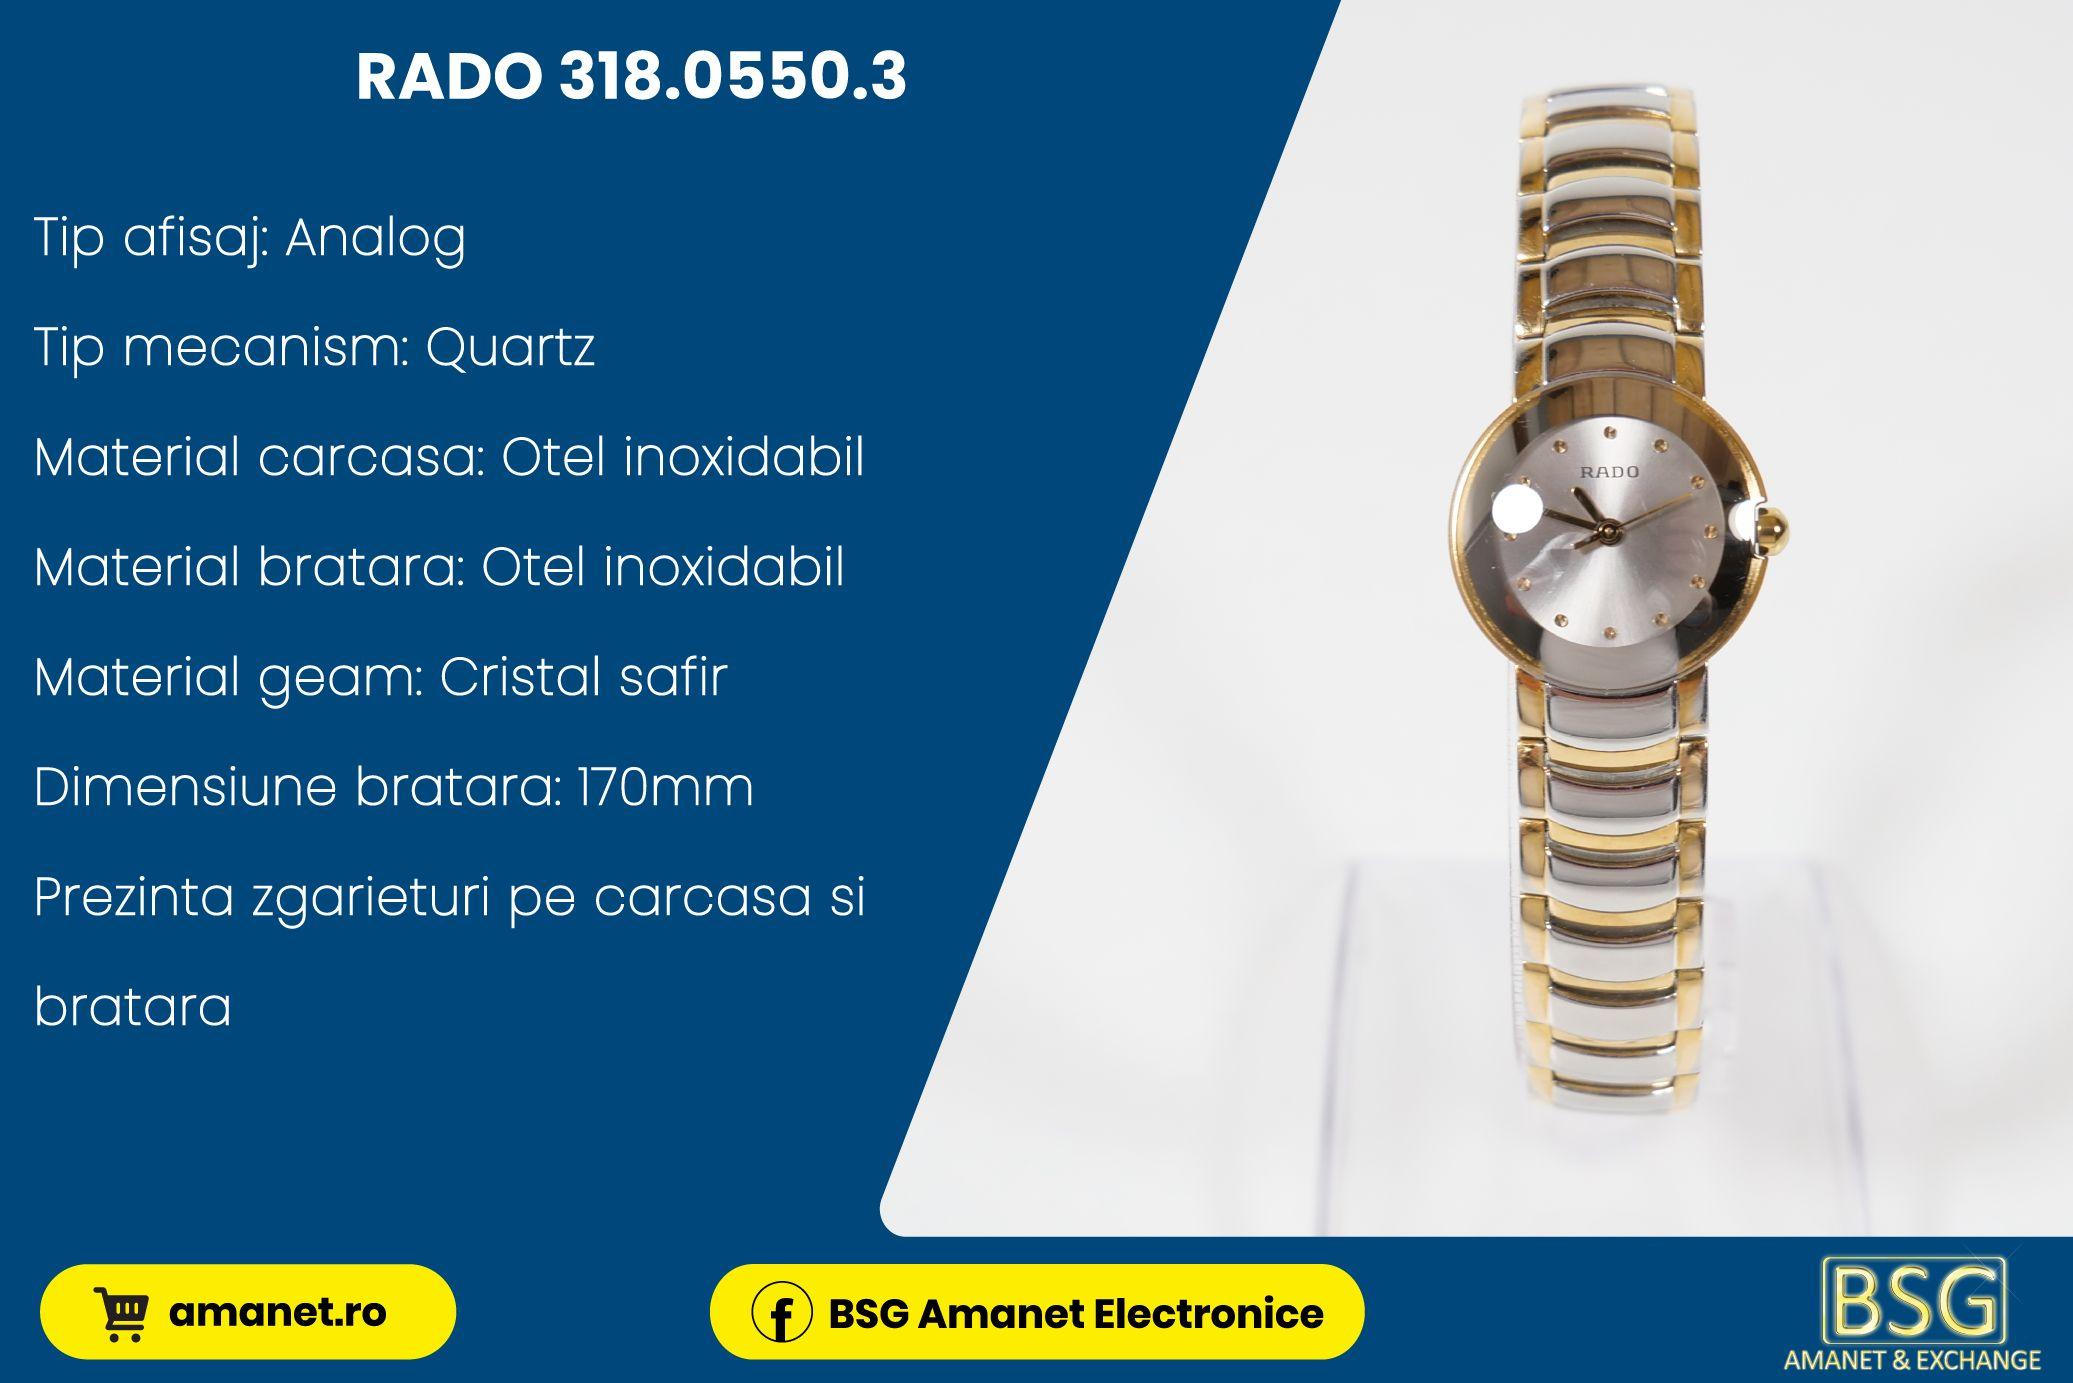 Ceas Rado 318.0550.3 - BSG Amanet & Exchange